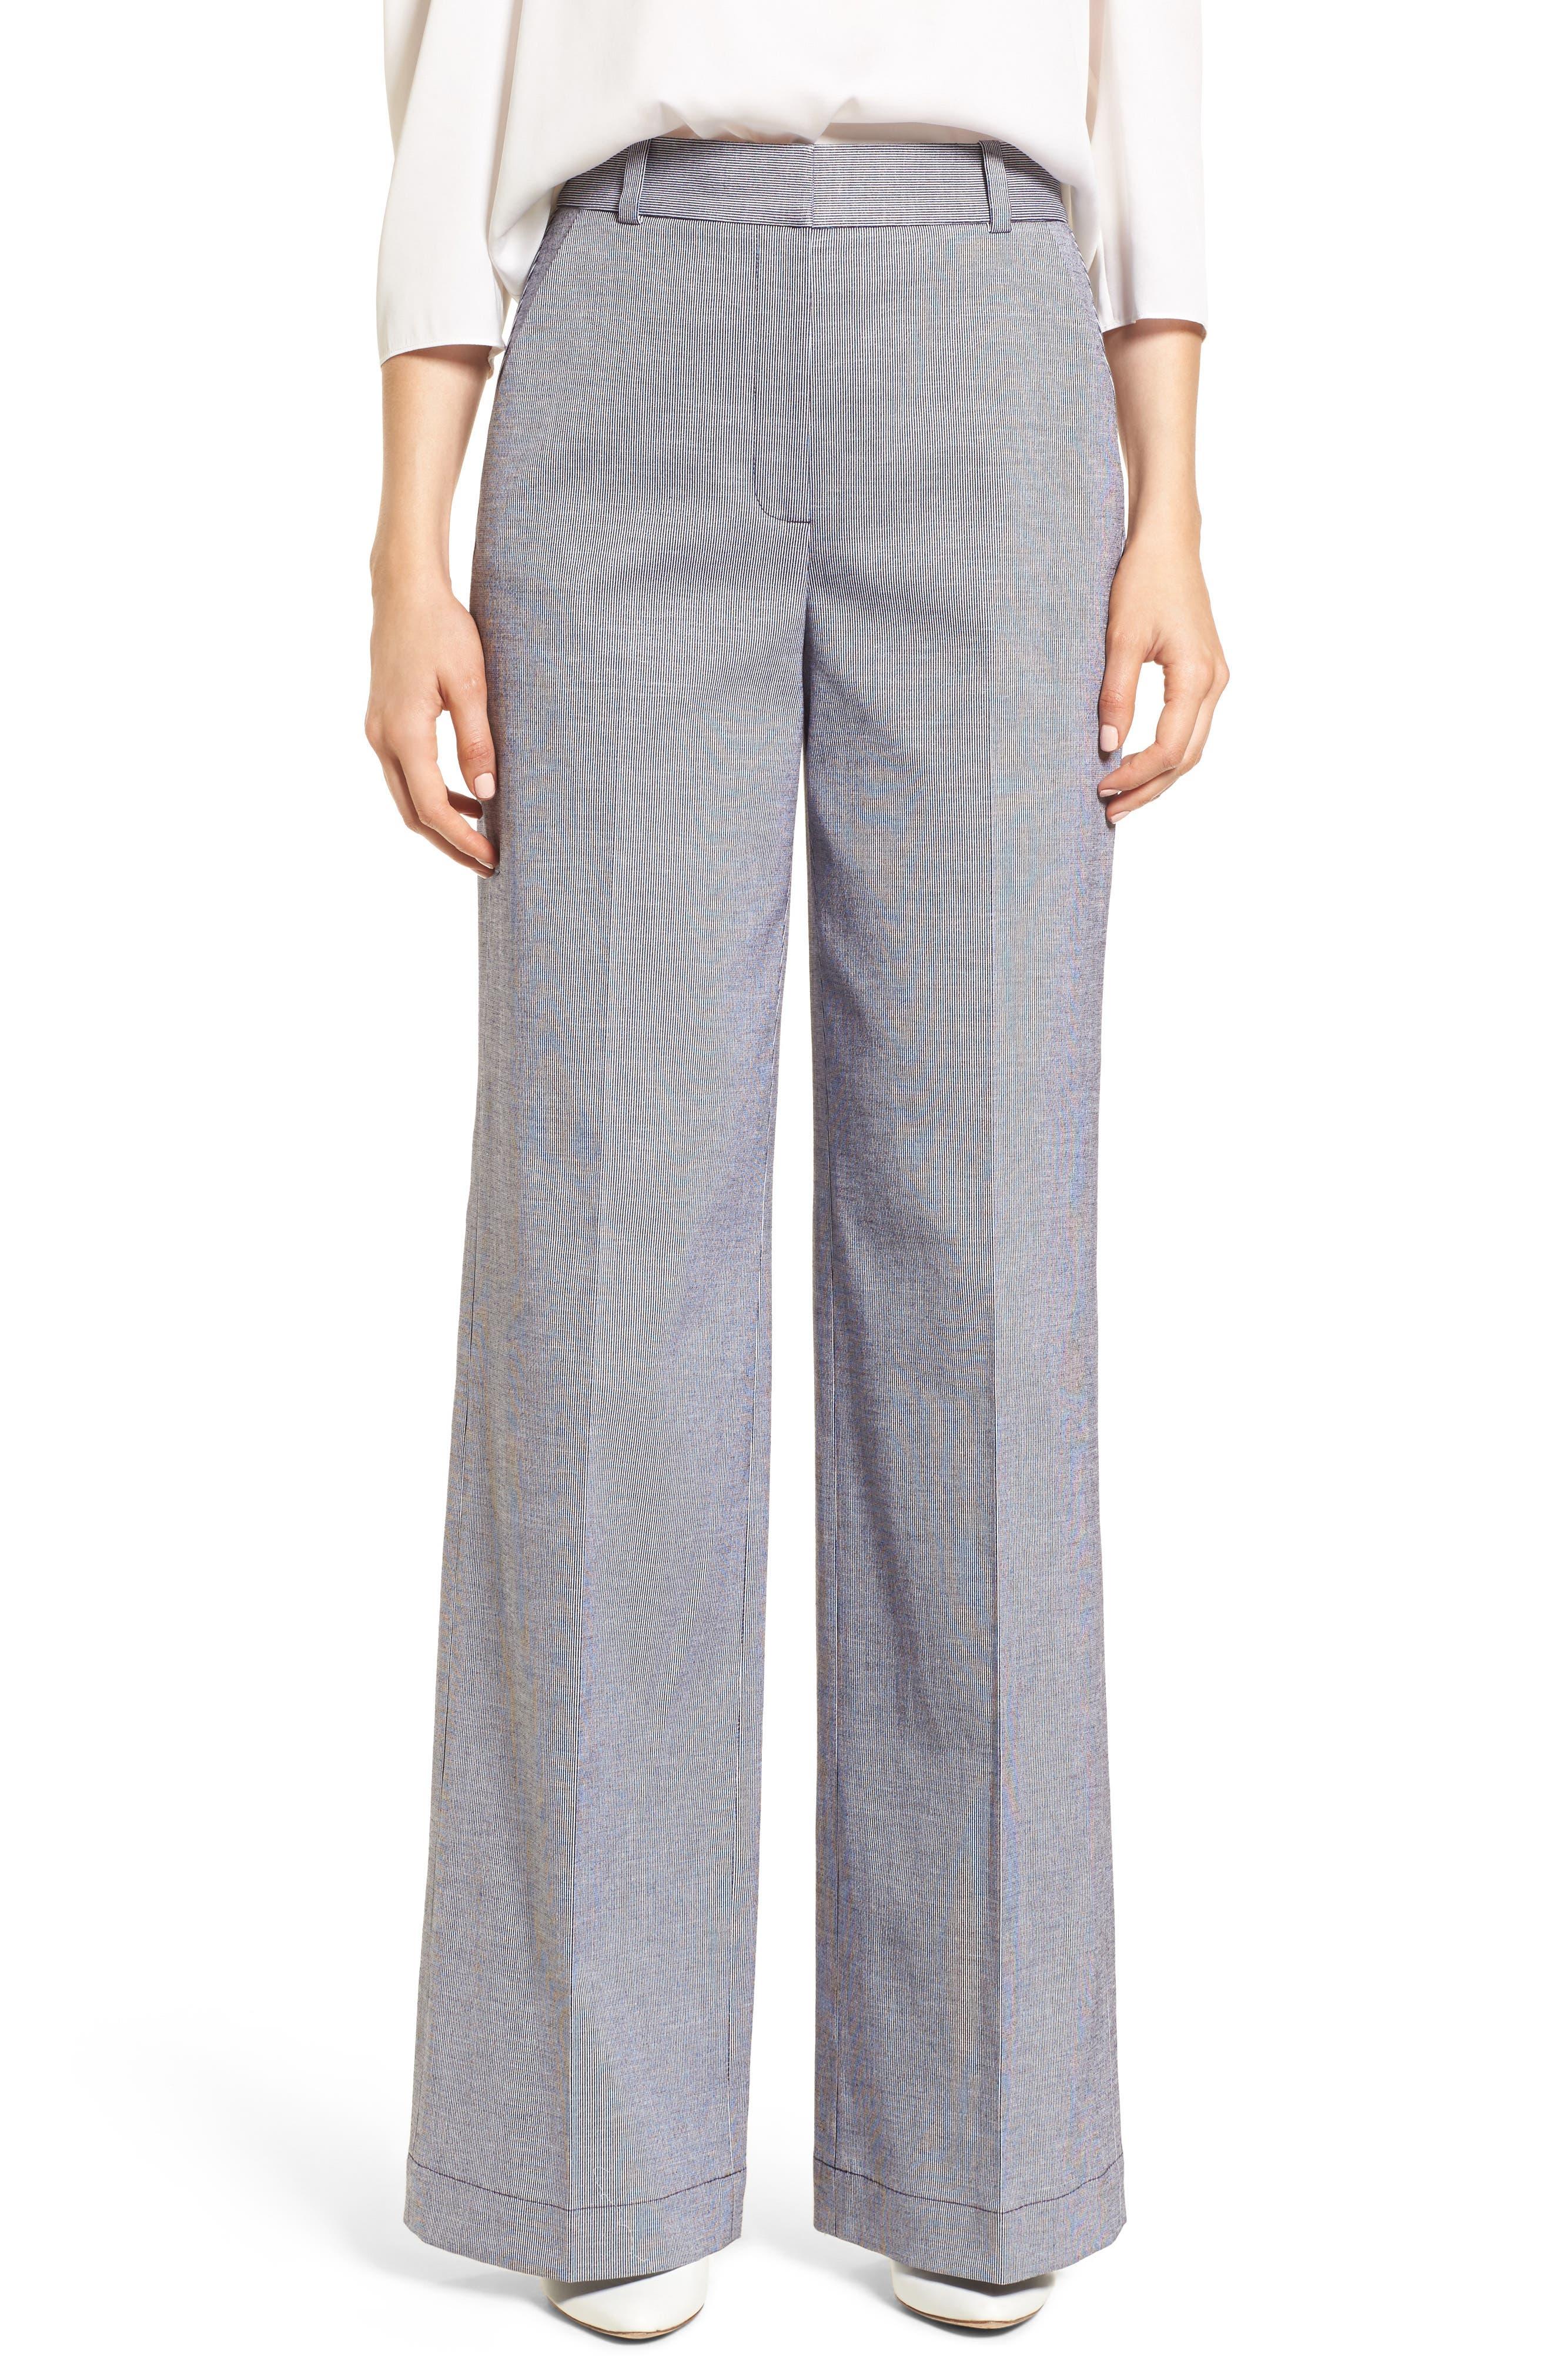 Ticking Stripe Pants,                         Main,                         color, 401